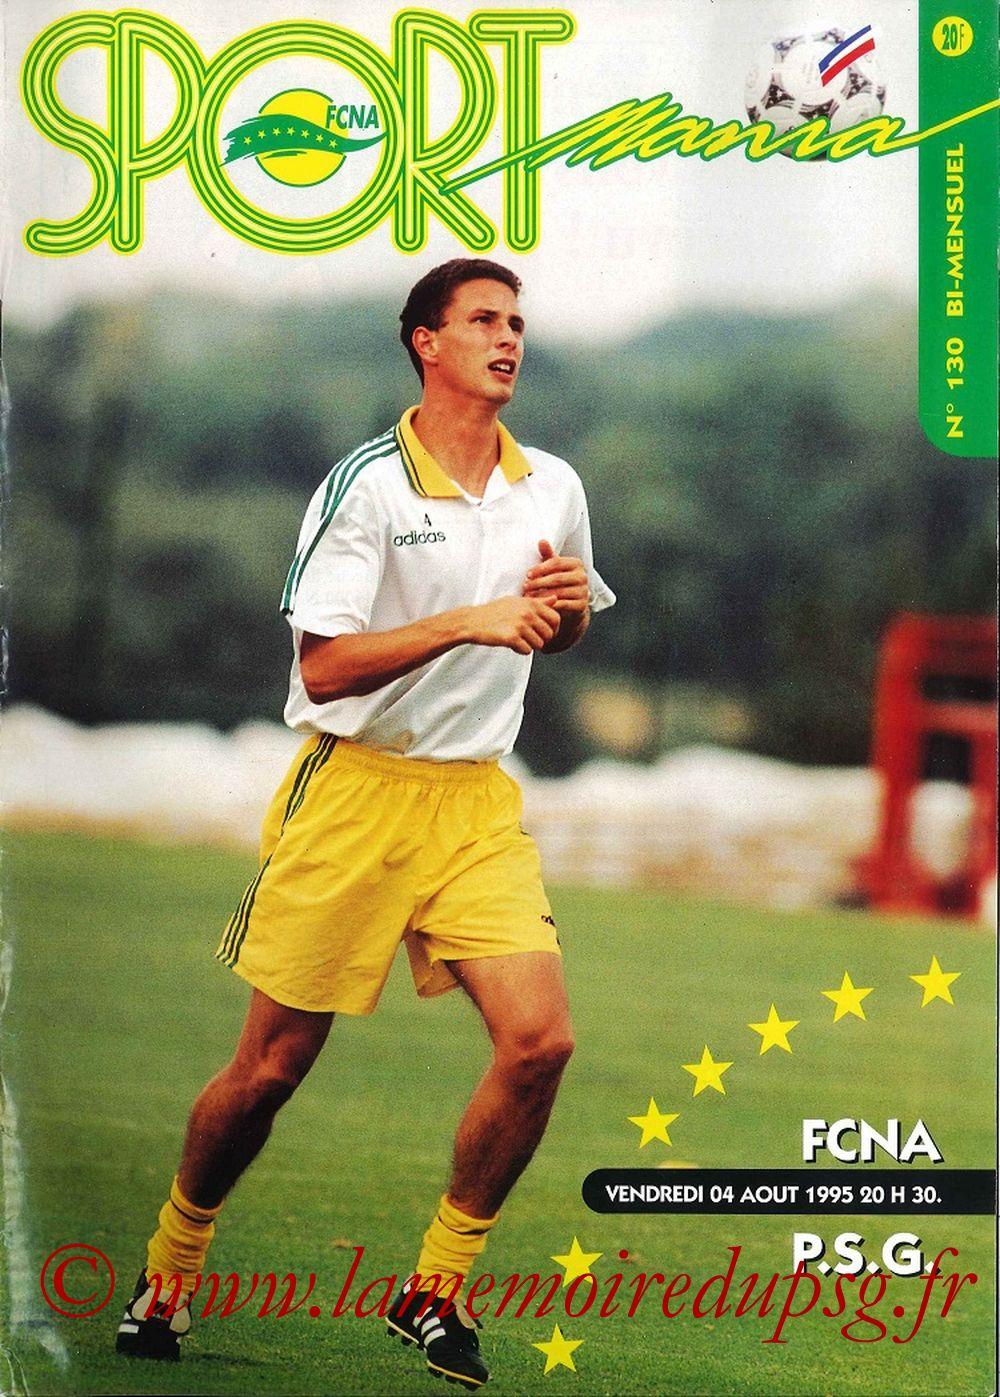 1995-08-04  Nantes-PSG (3ème D1, Sportmania N°130)